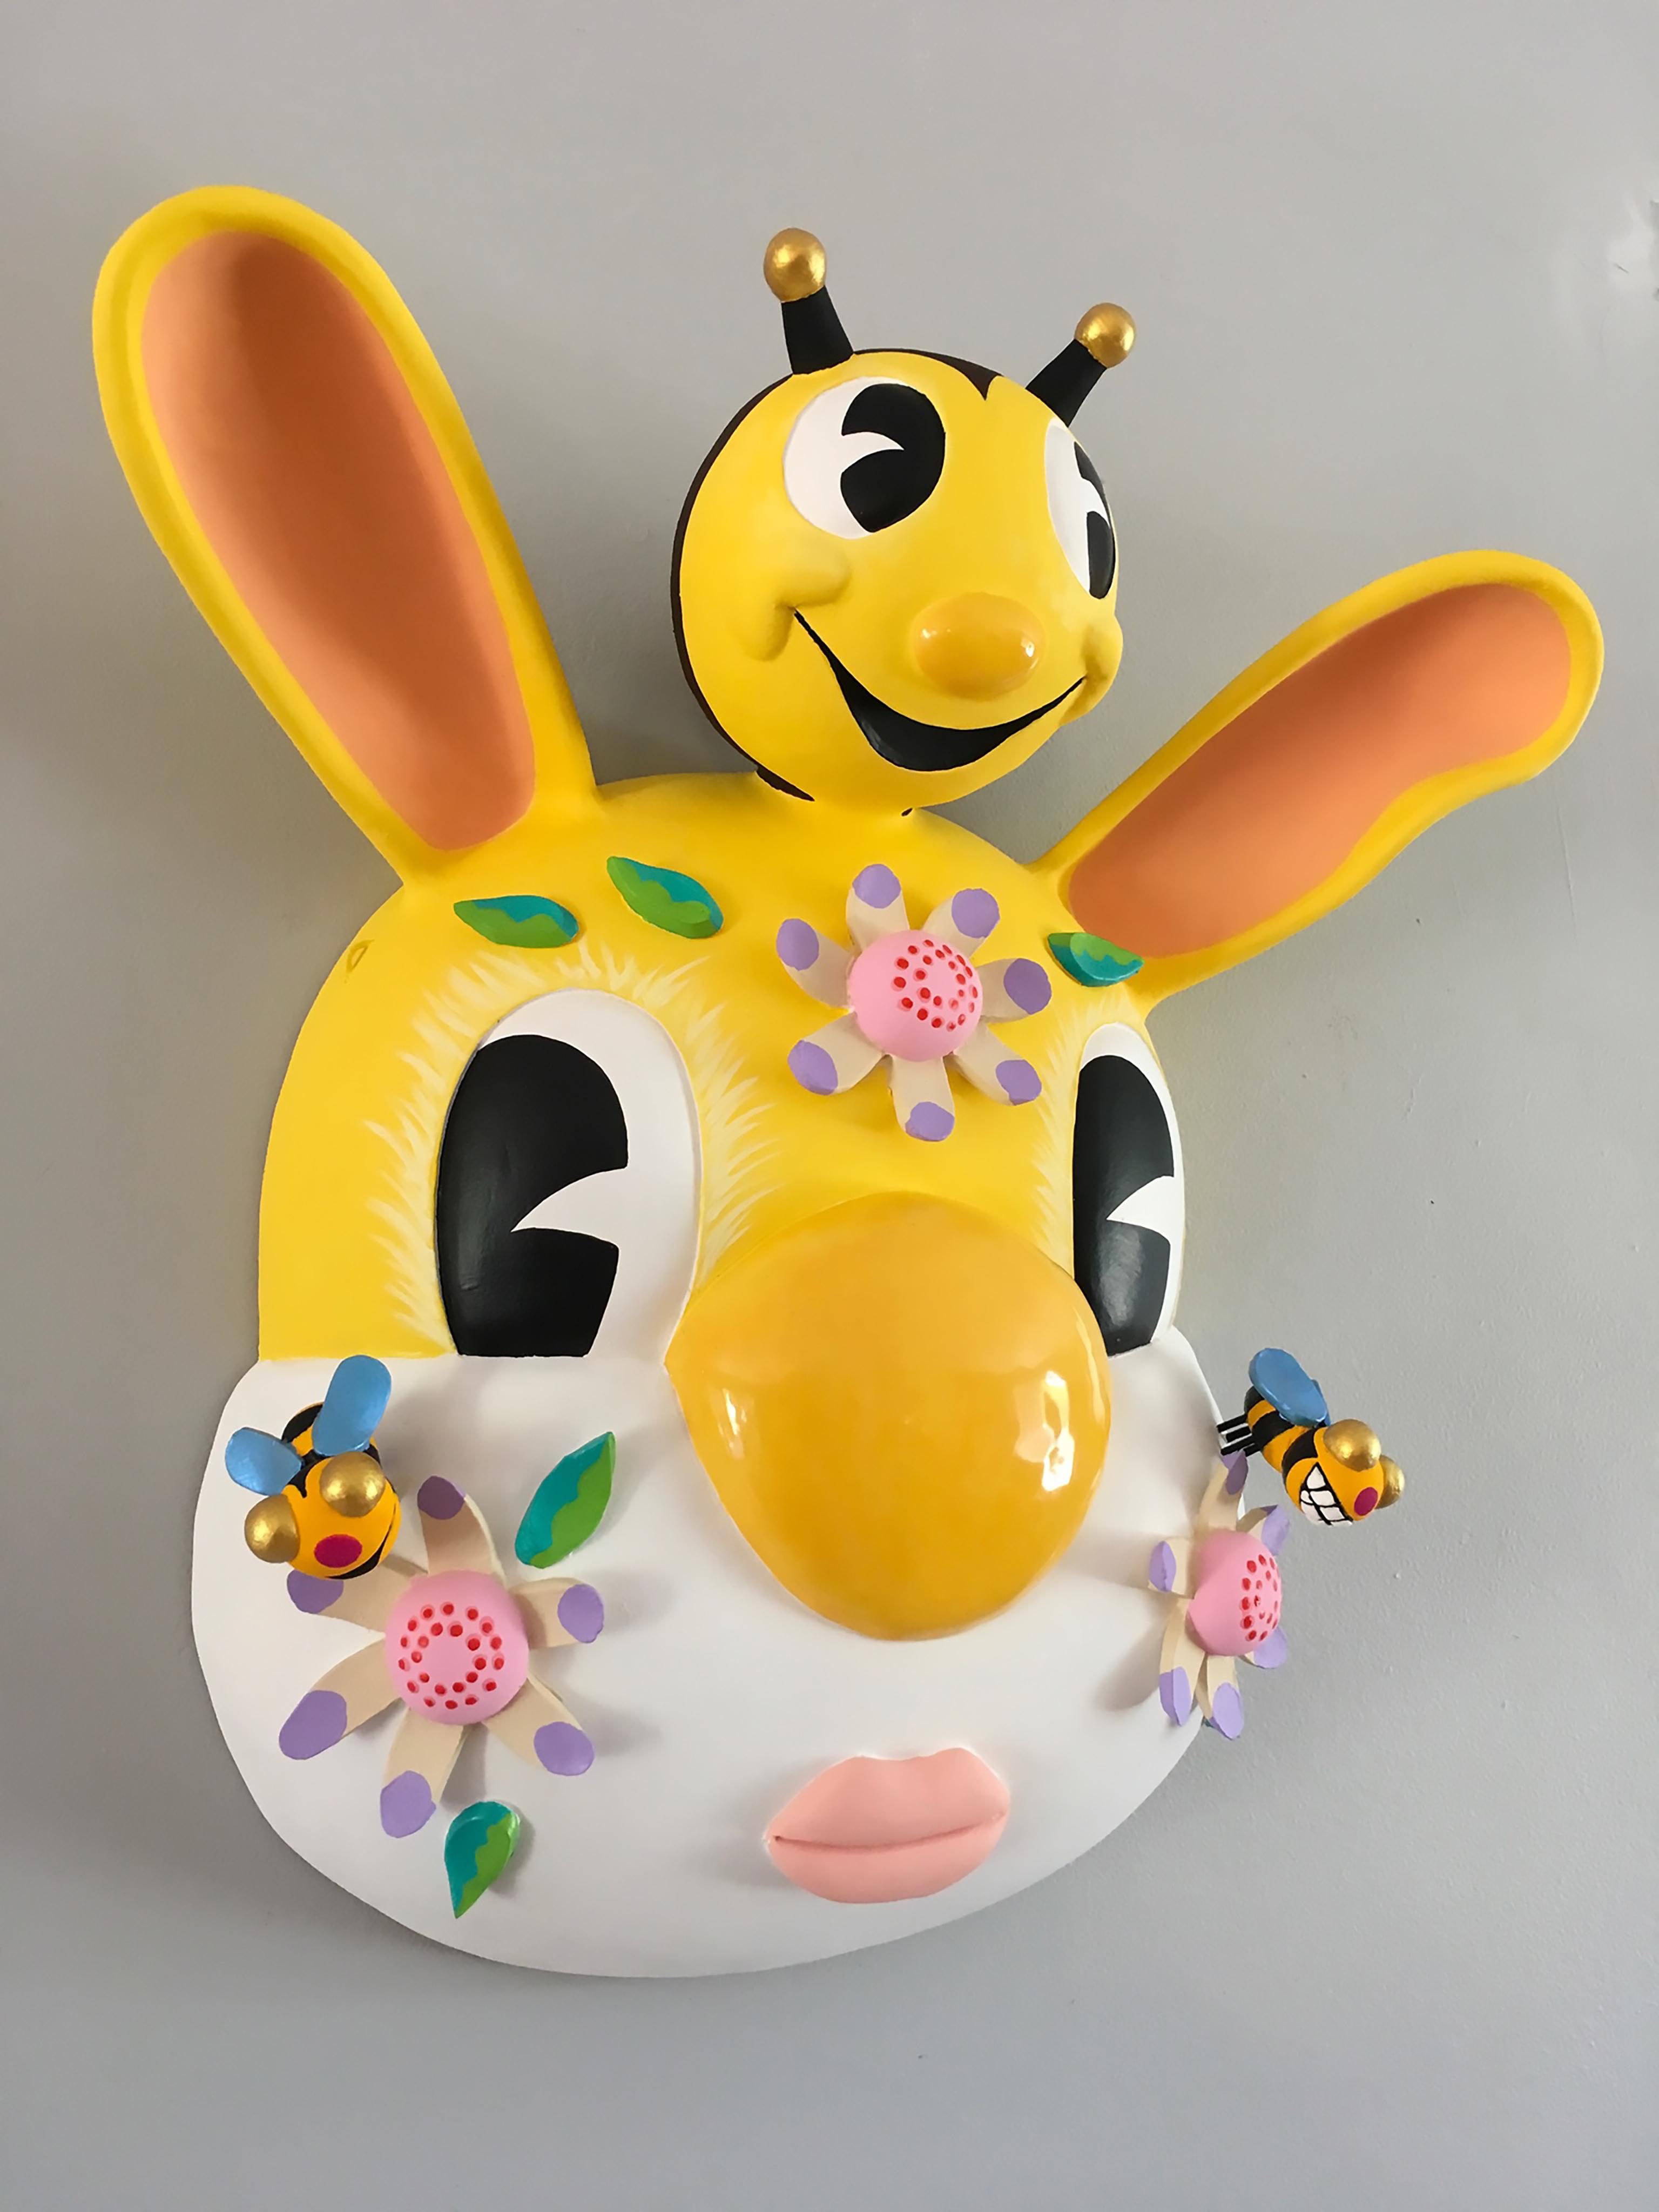 Max_Lehman_Hunny_Bunny-2